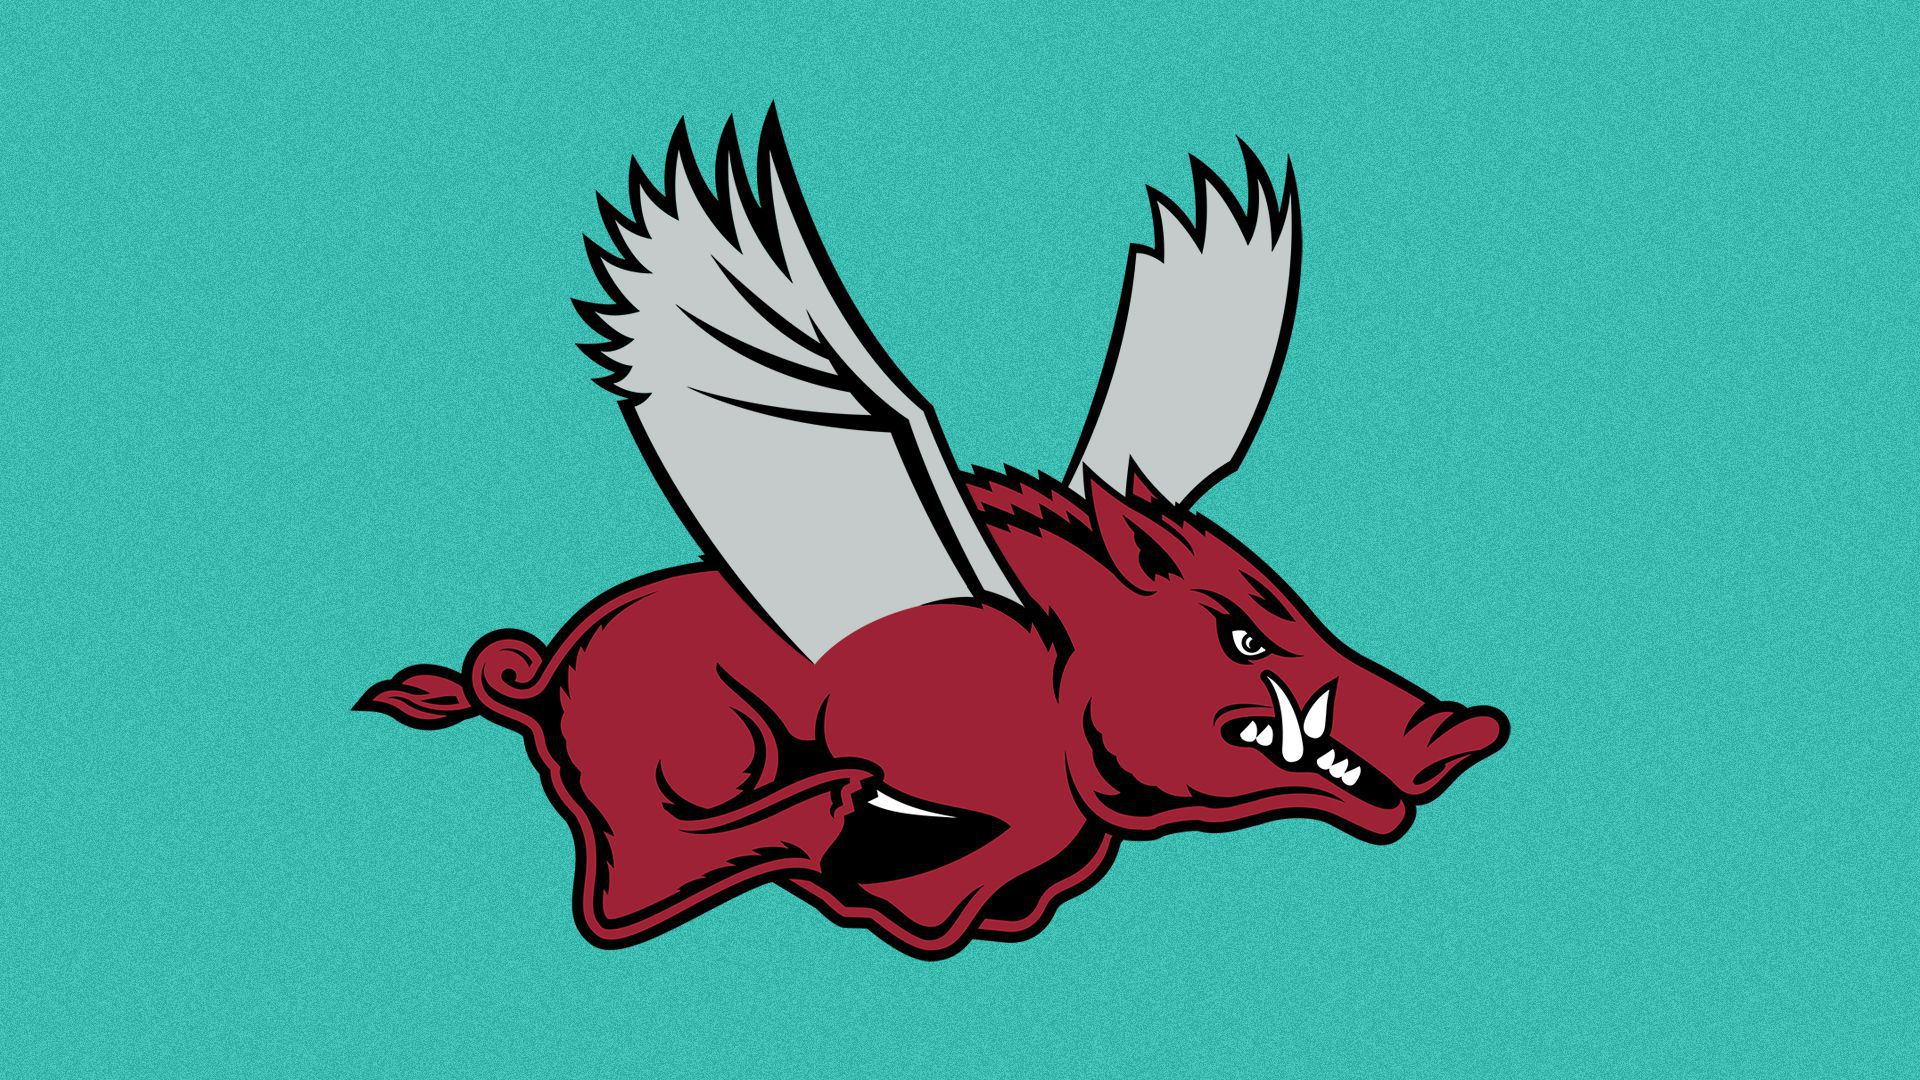 Illustration of the University of Arkansas Razorback logo with wings added.